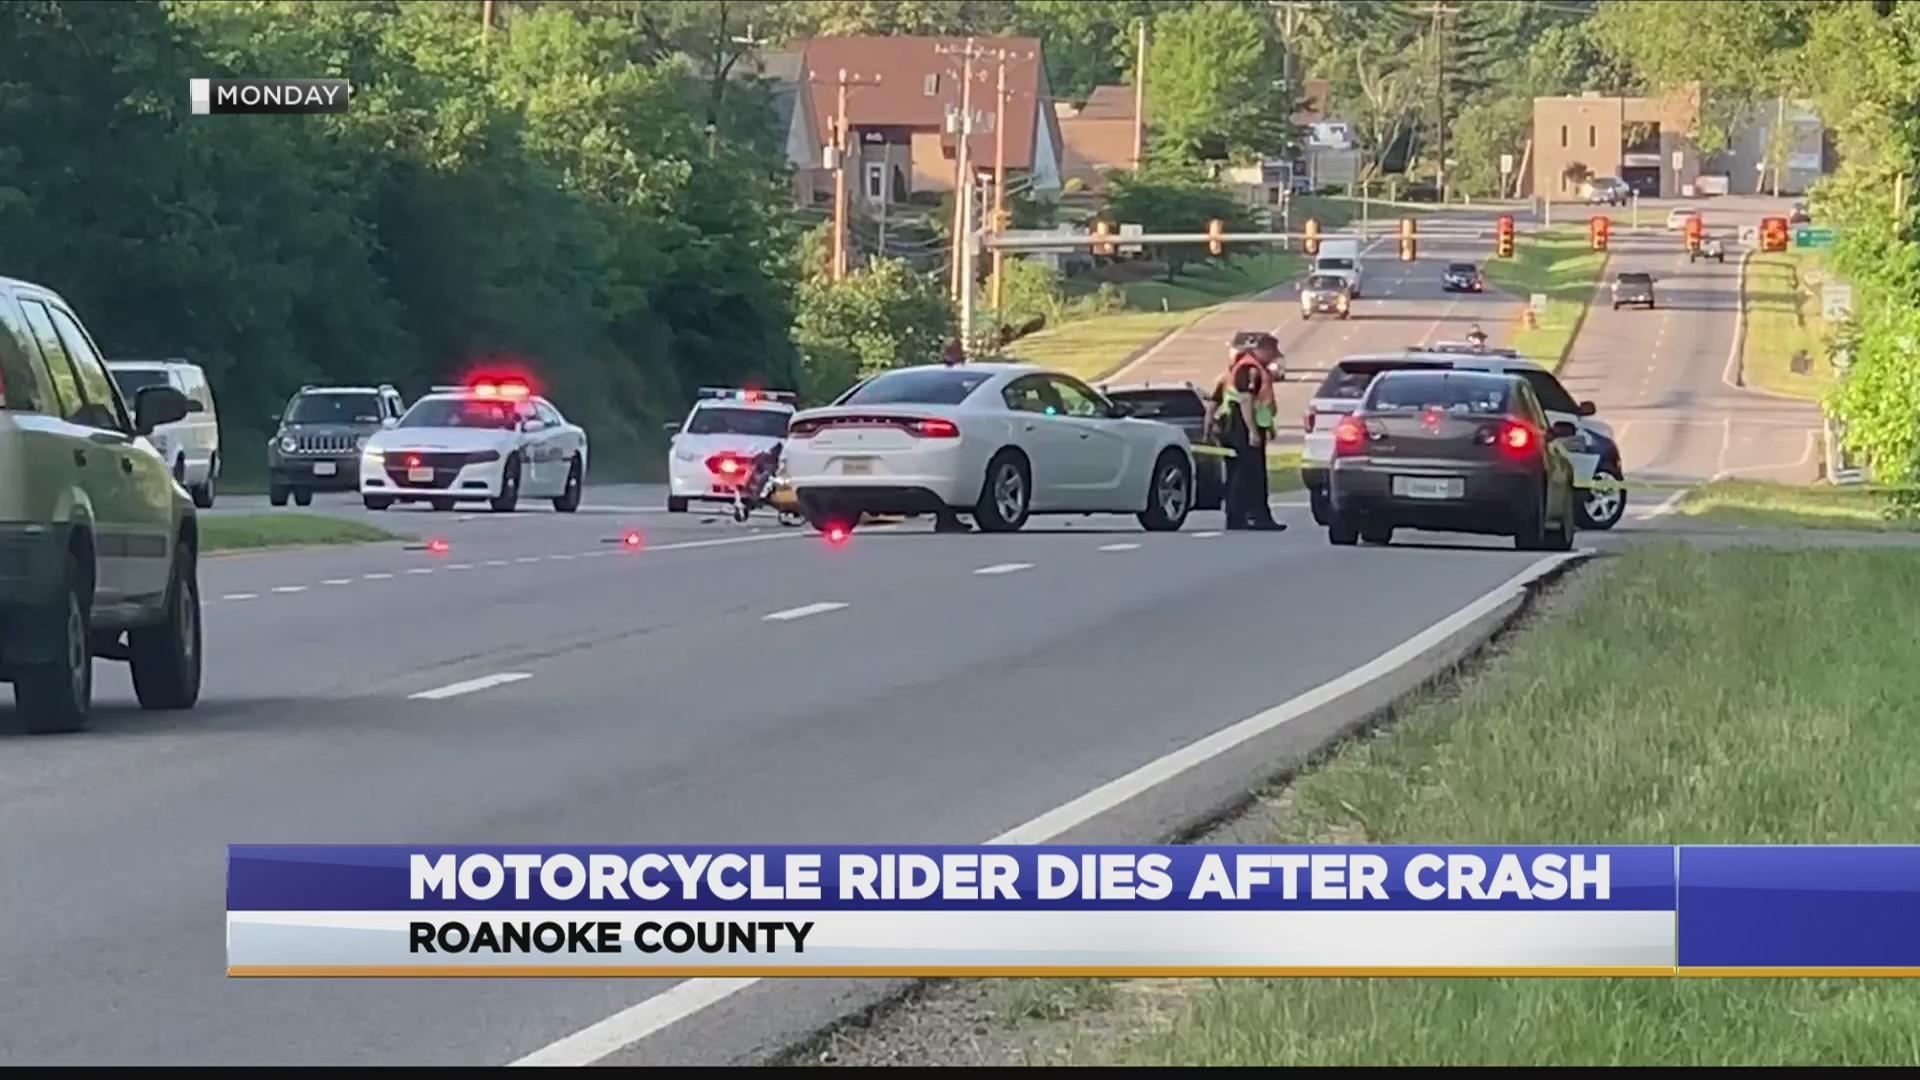 Motorcycle rider dies after crash